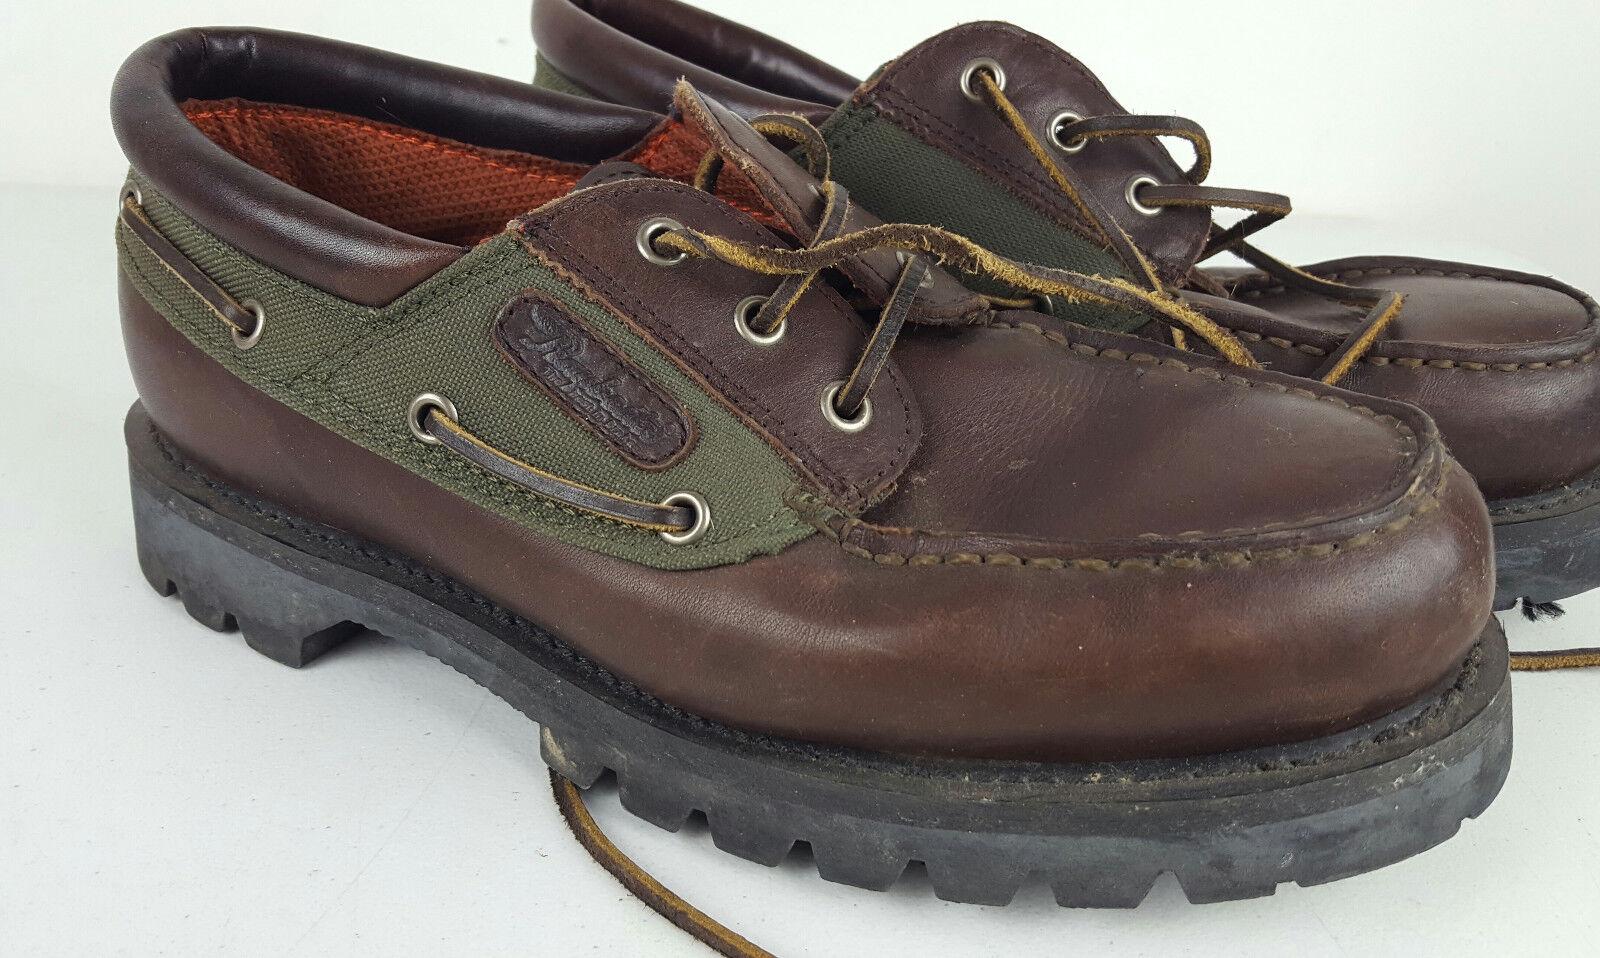 Raybestos Heavy Duty Work Shoe Brown Green Goodyear Welt Men's 9.5 RPP2000